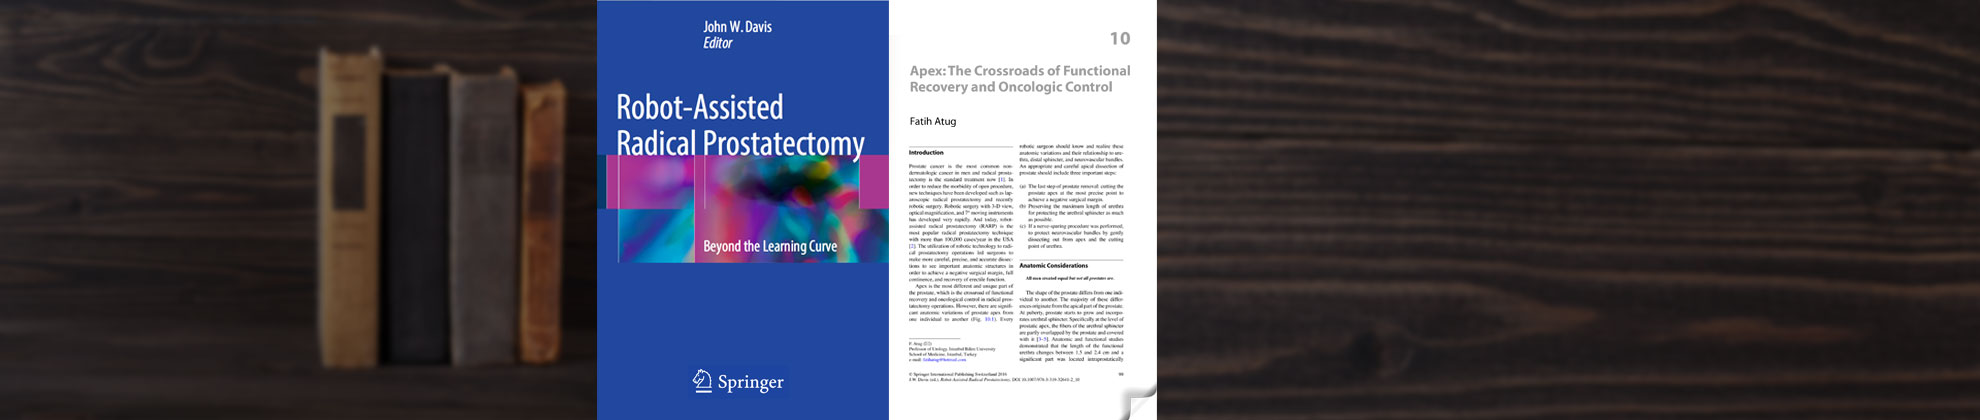 robot-assisted-radical-prostatectomy